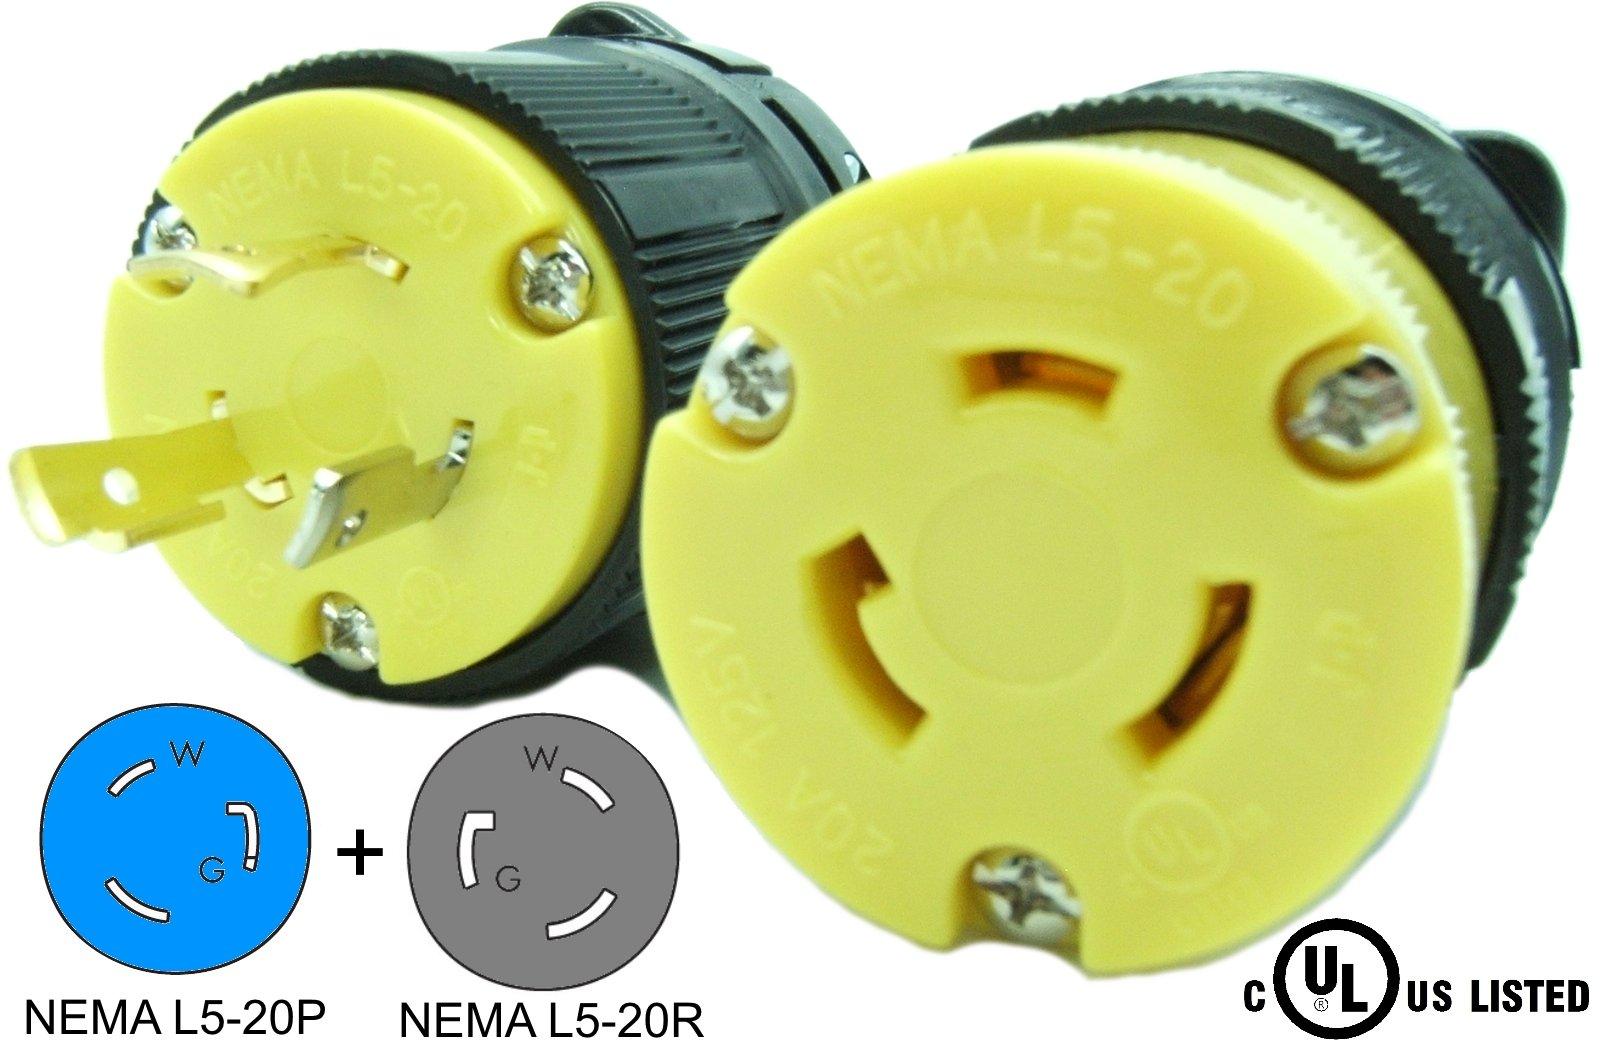 Journeyman-Pro 20 Amp, Plug & Connector Set, NEMA L5-20R & L5-20P, 125V, Locking Plug Socket, Black Industrial Grade, Grounding 2500 Watts Generators (L5-20PR PLUG SET)